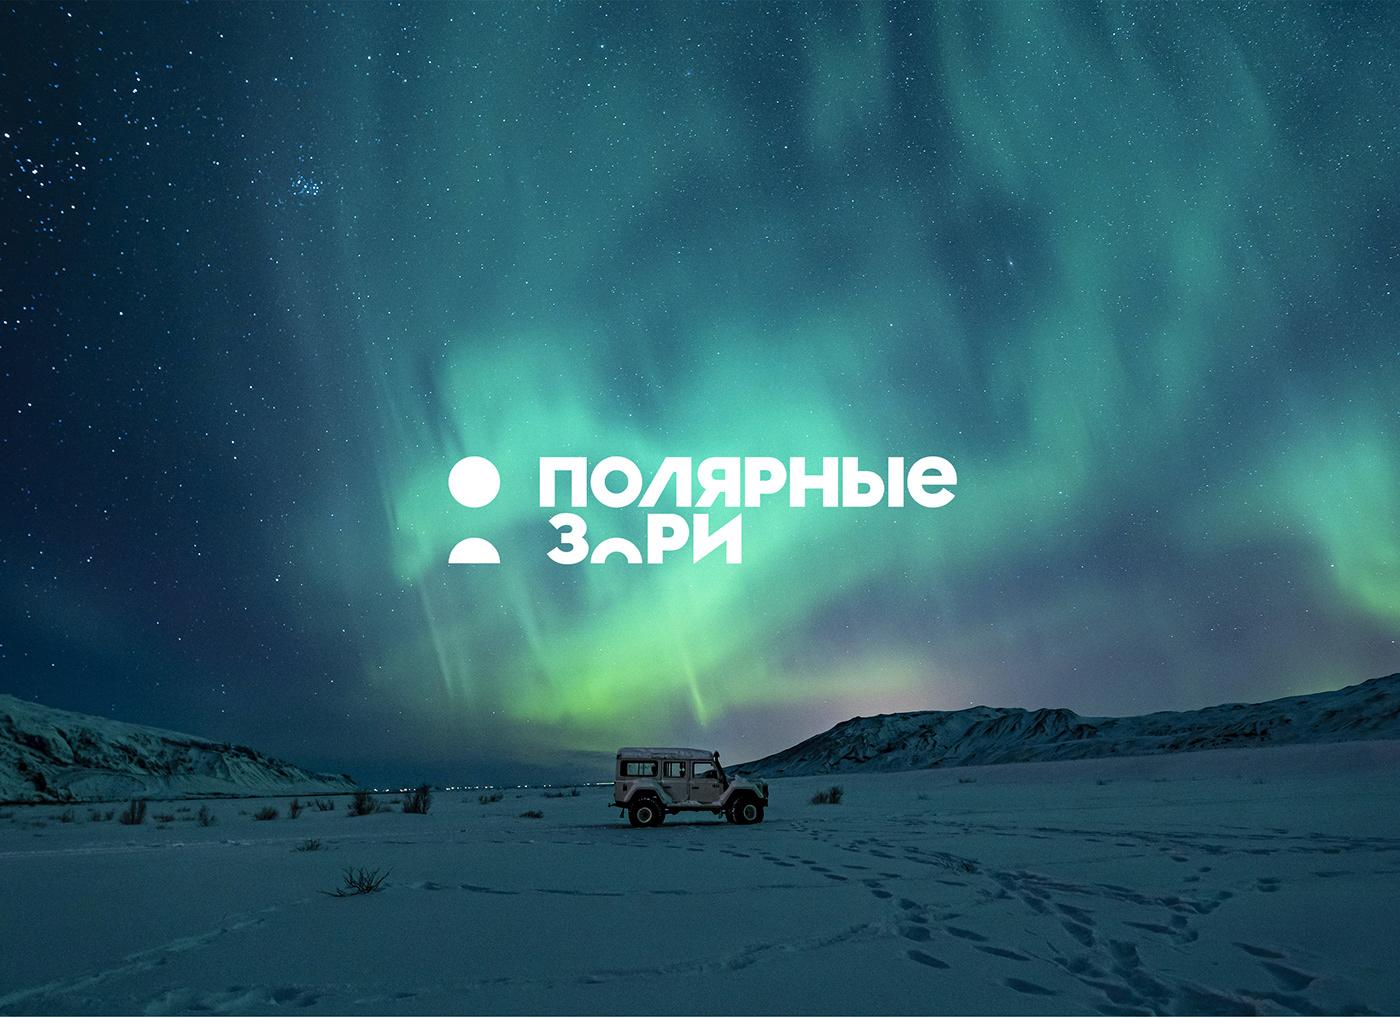 Image may contain: snow, screenshot and nature